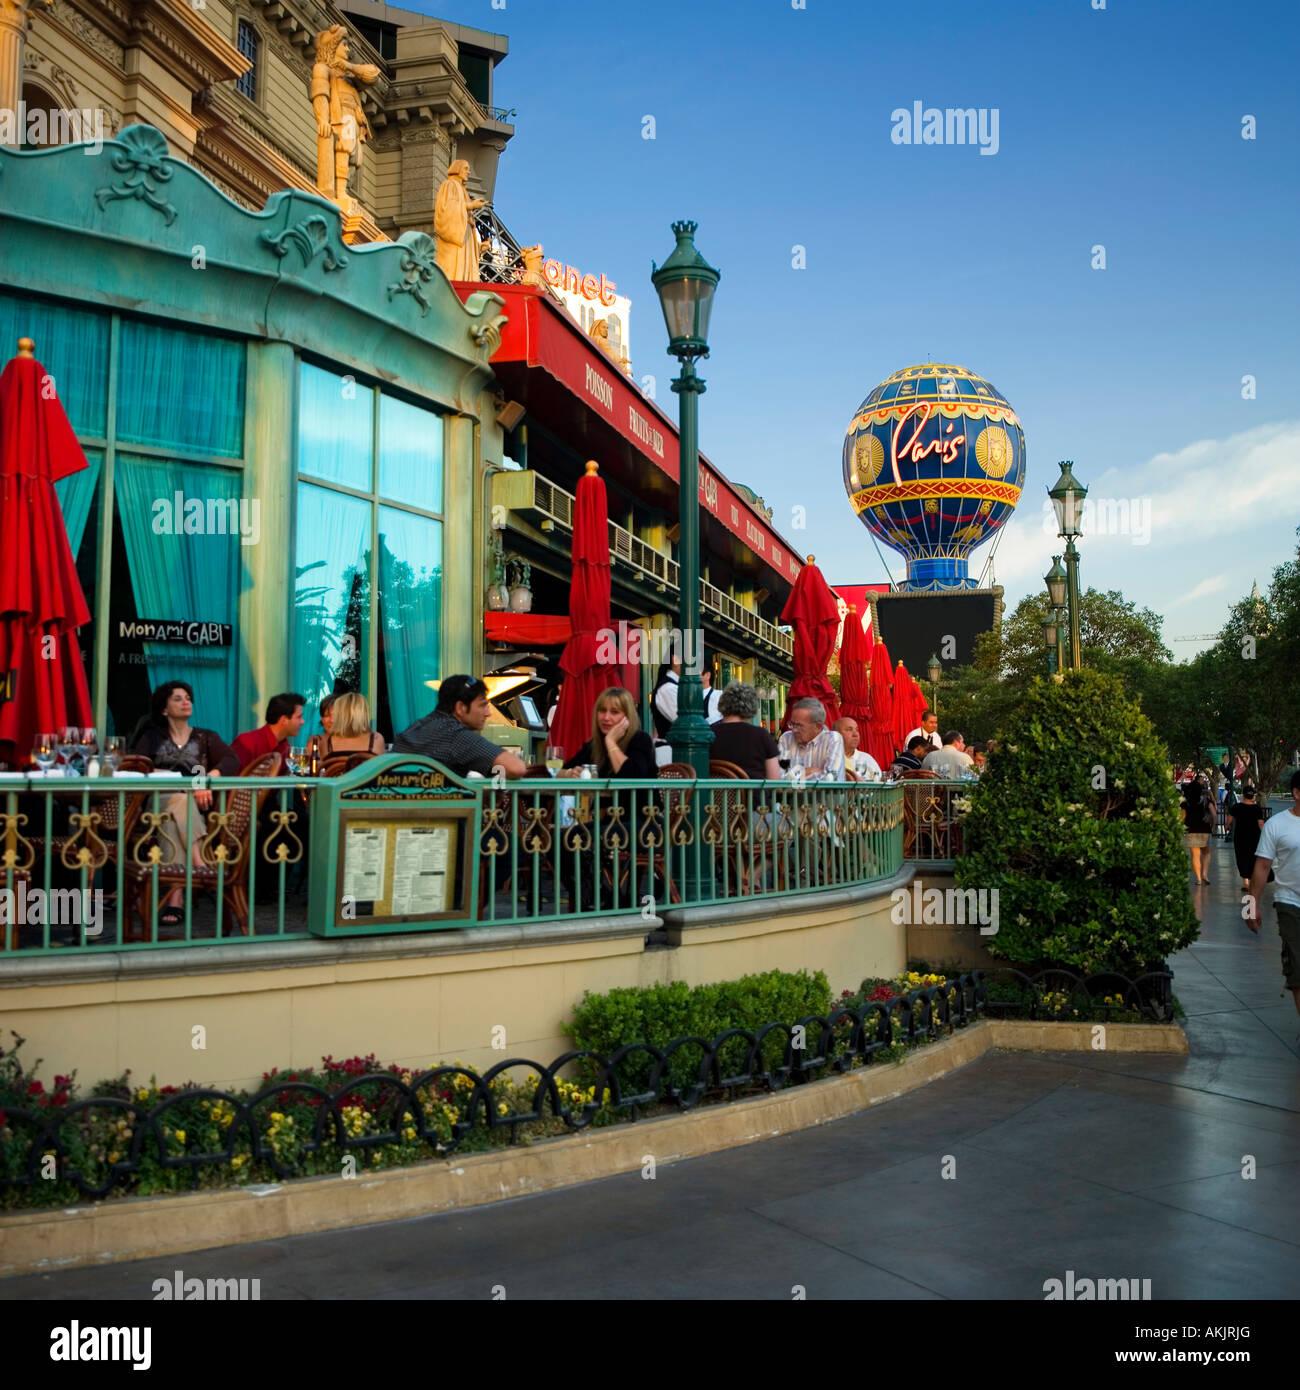 hot air balloon Paris Hotel skyline Las Vegas Stock Photo, Royalty ...